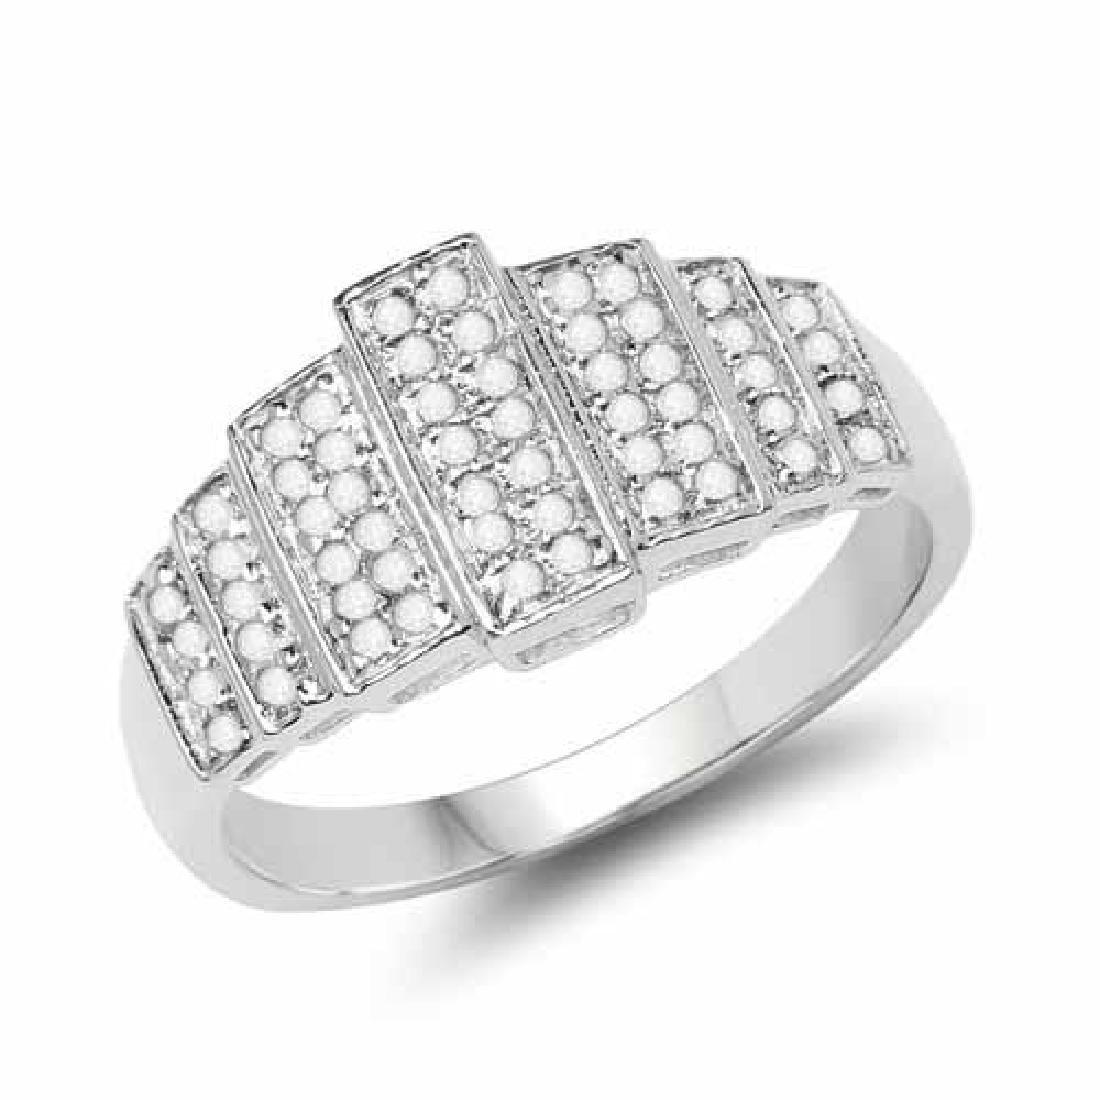 14K White Gold Plated 0.26 Carat Genuine White Diamond